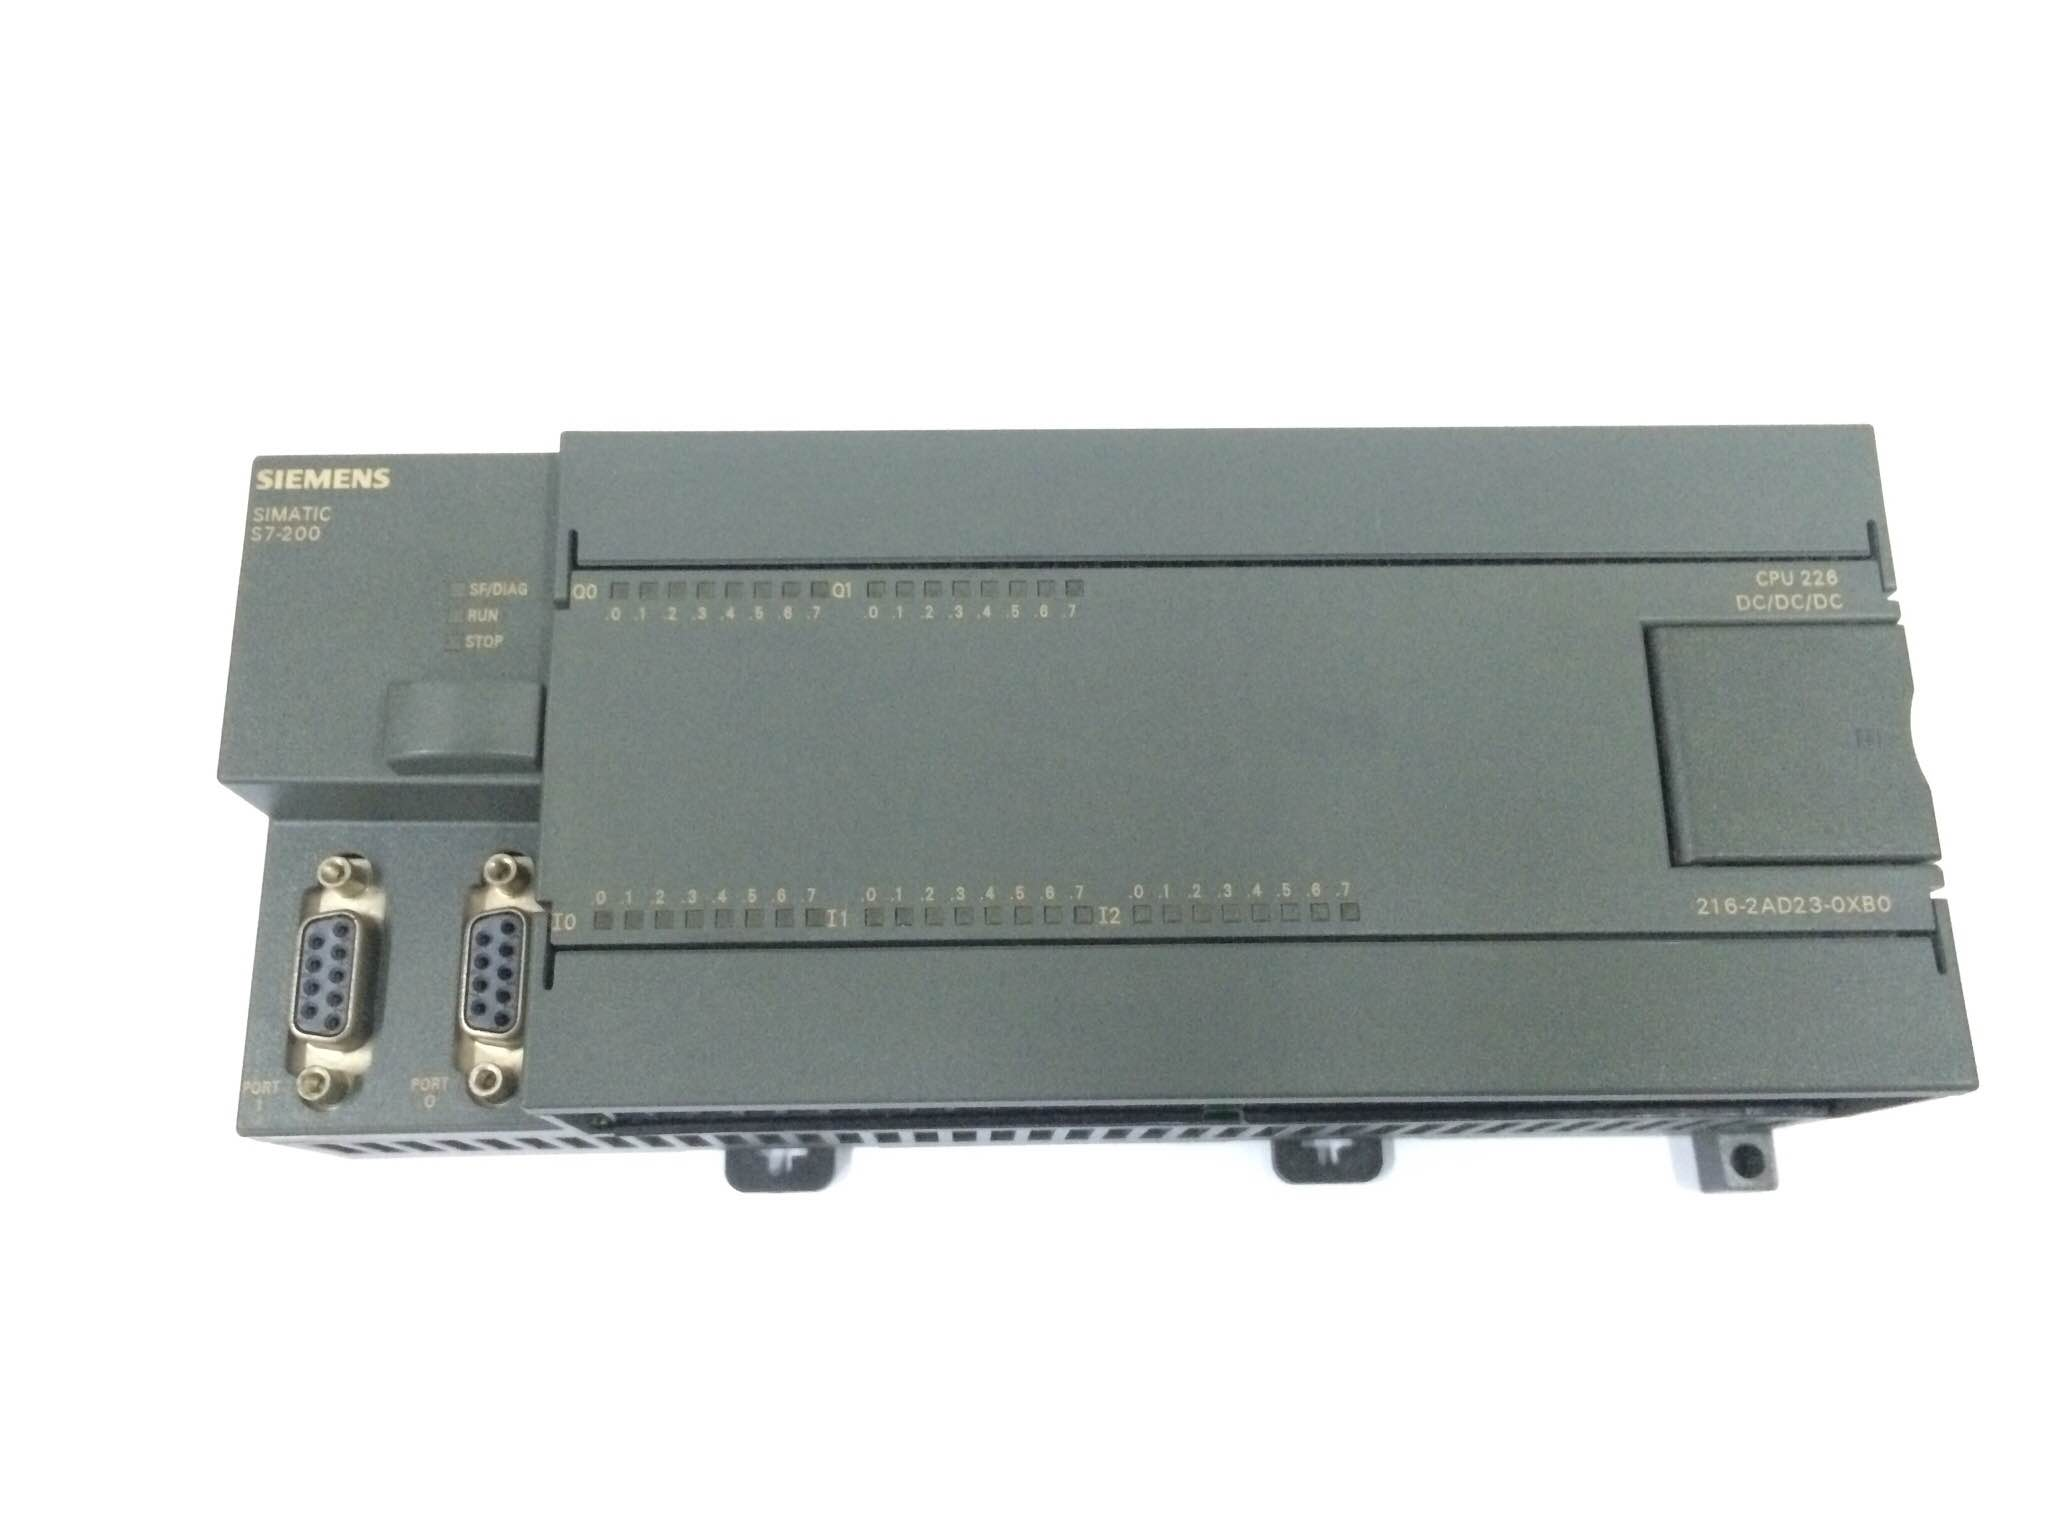 CPU226 DC/DC/DC: 6ES7 216-2AD23-0XB0 S7-200 PLC